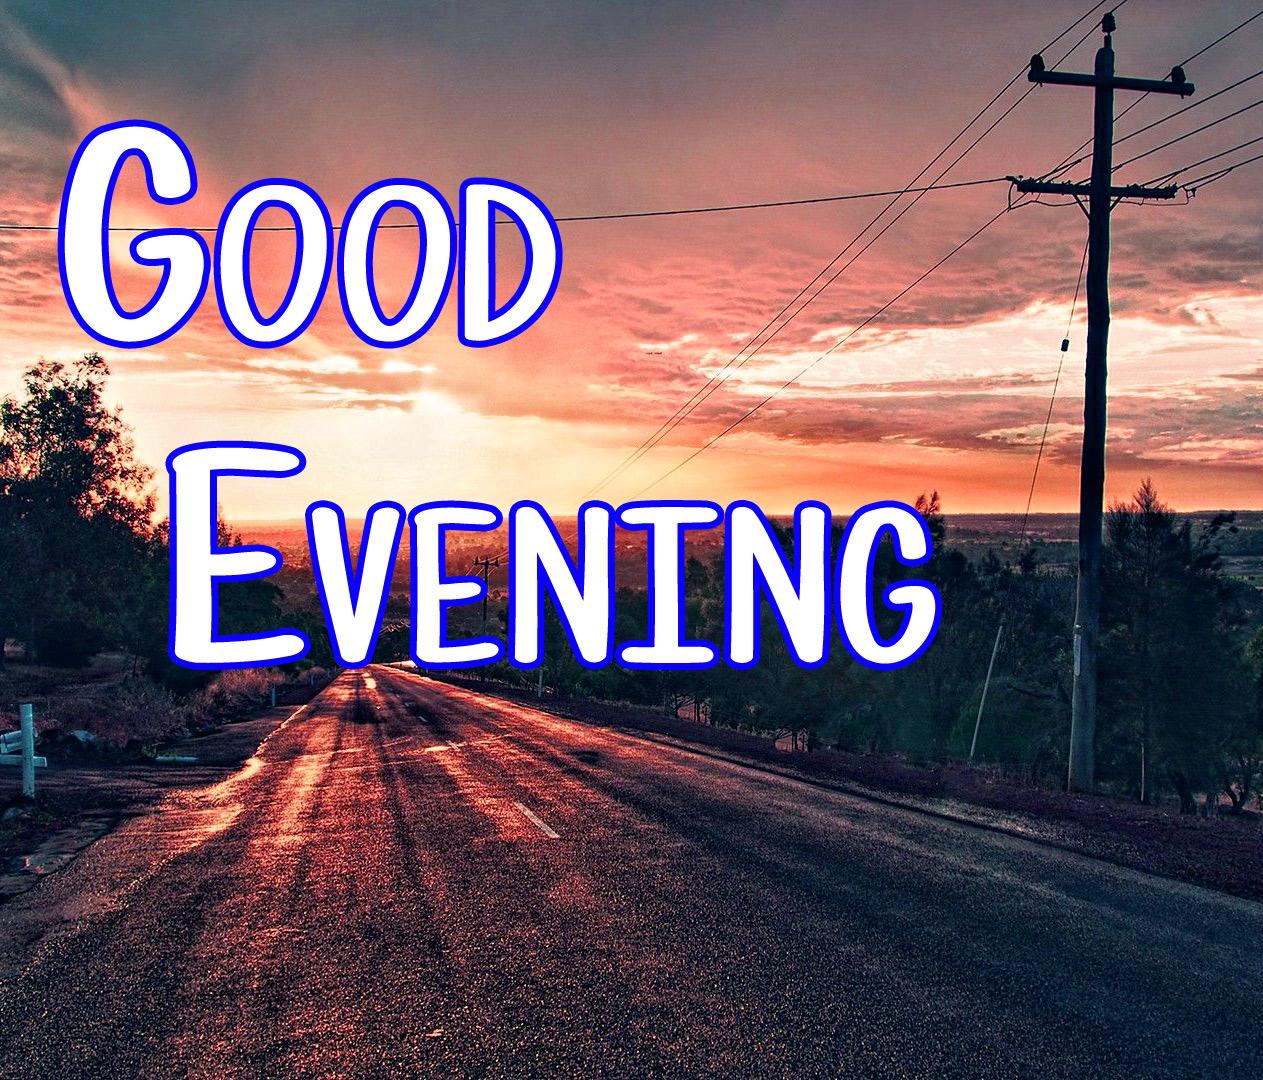 good evening photo 12